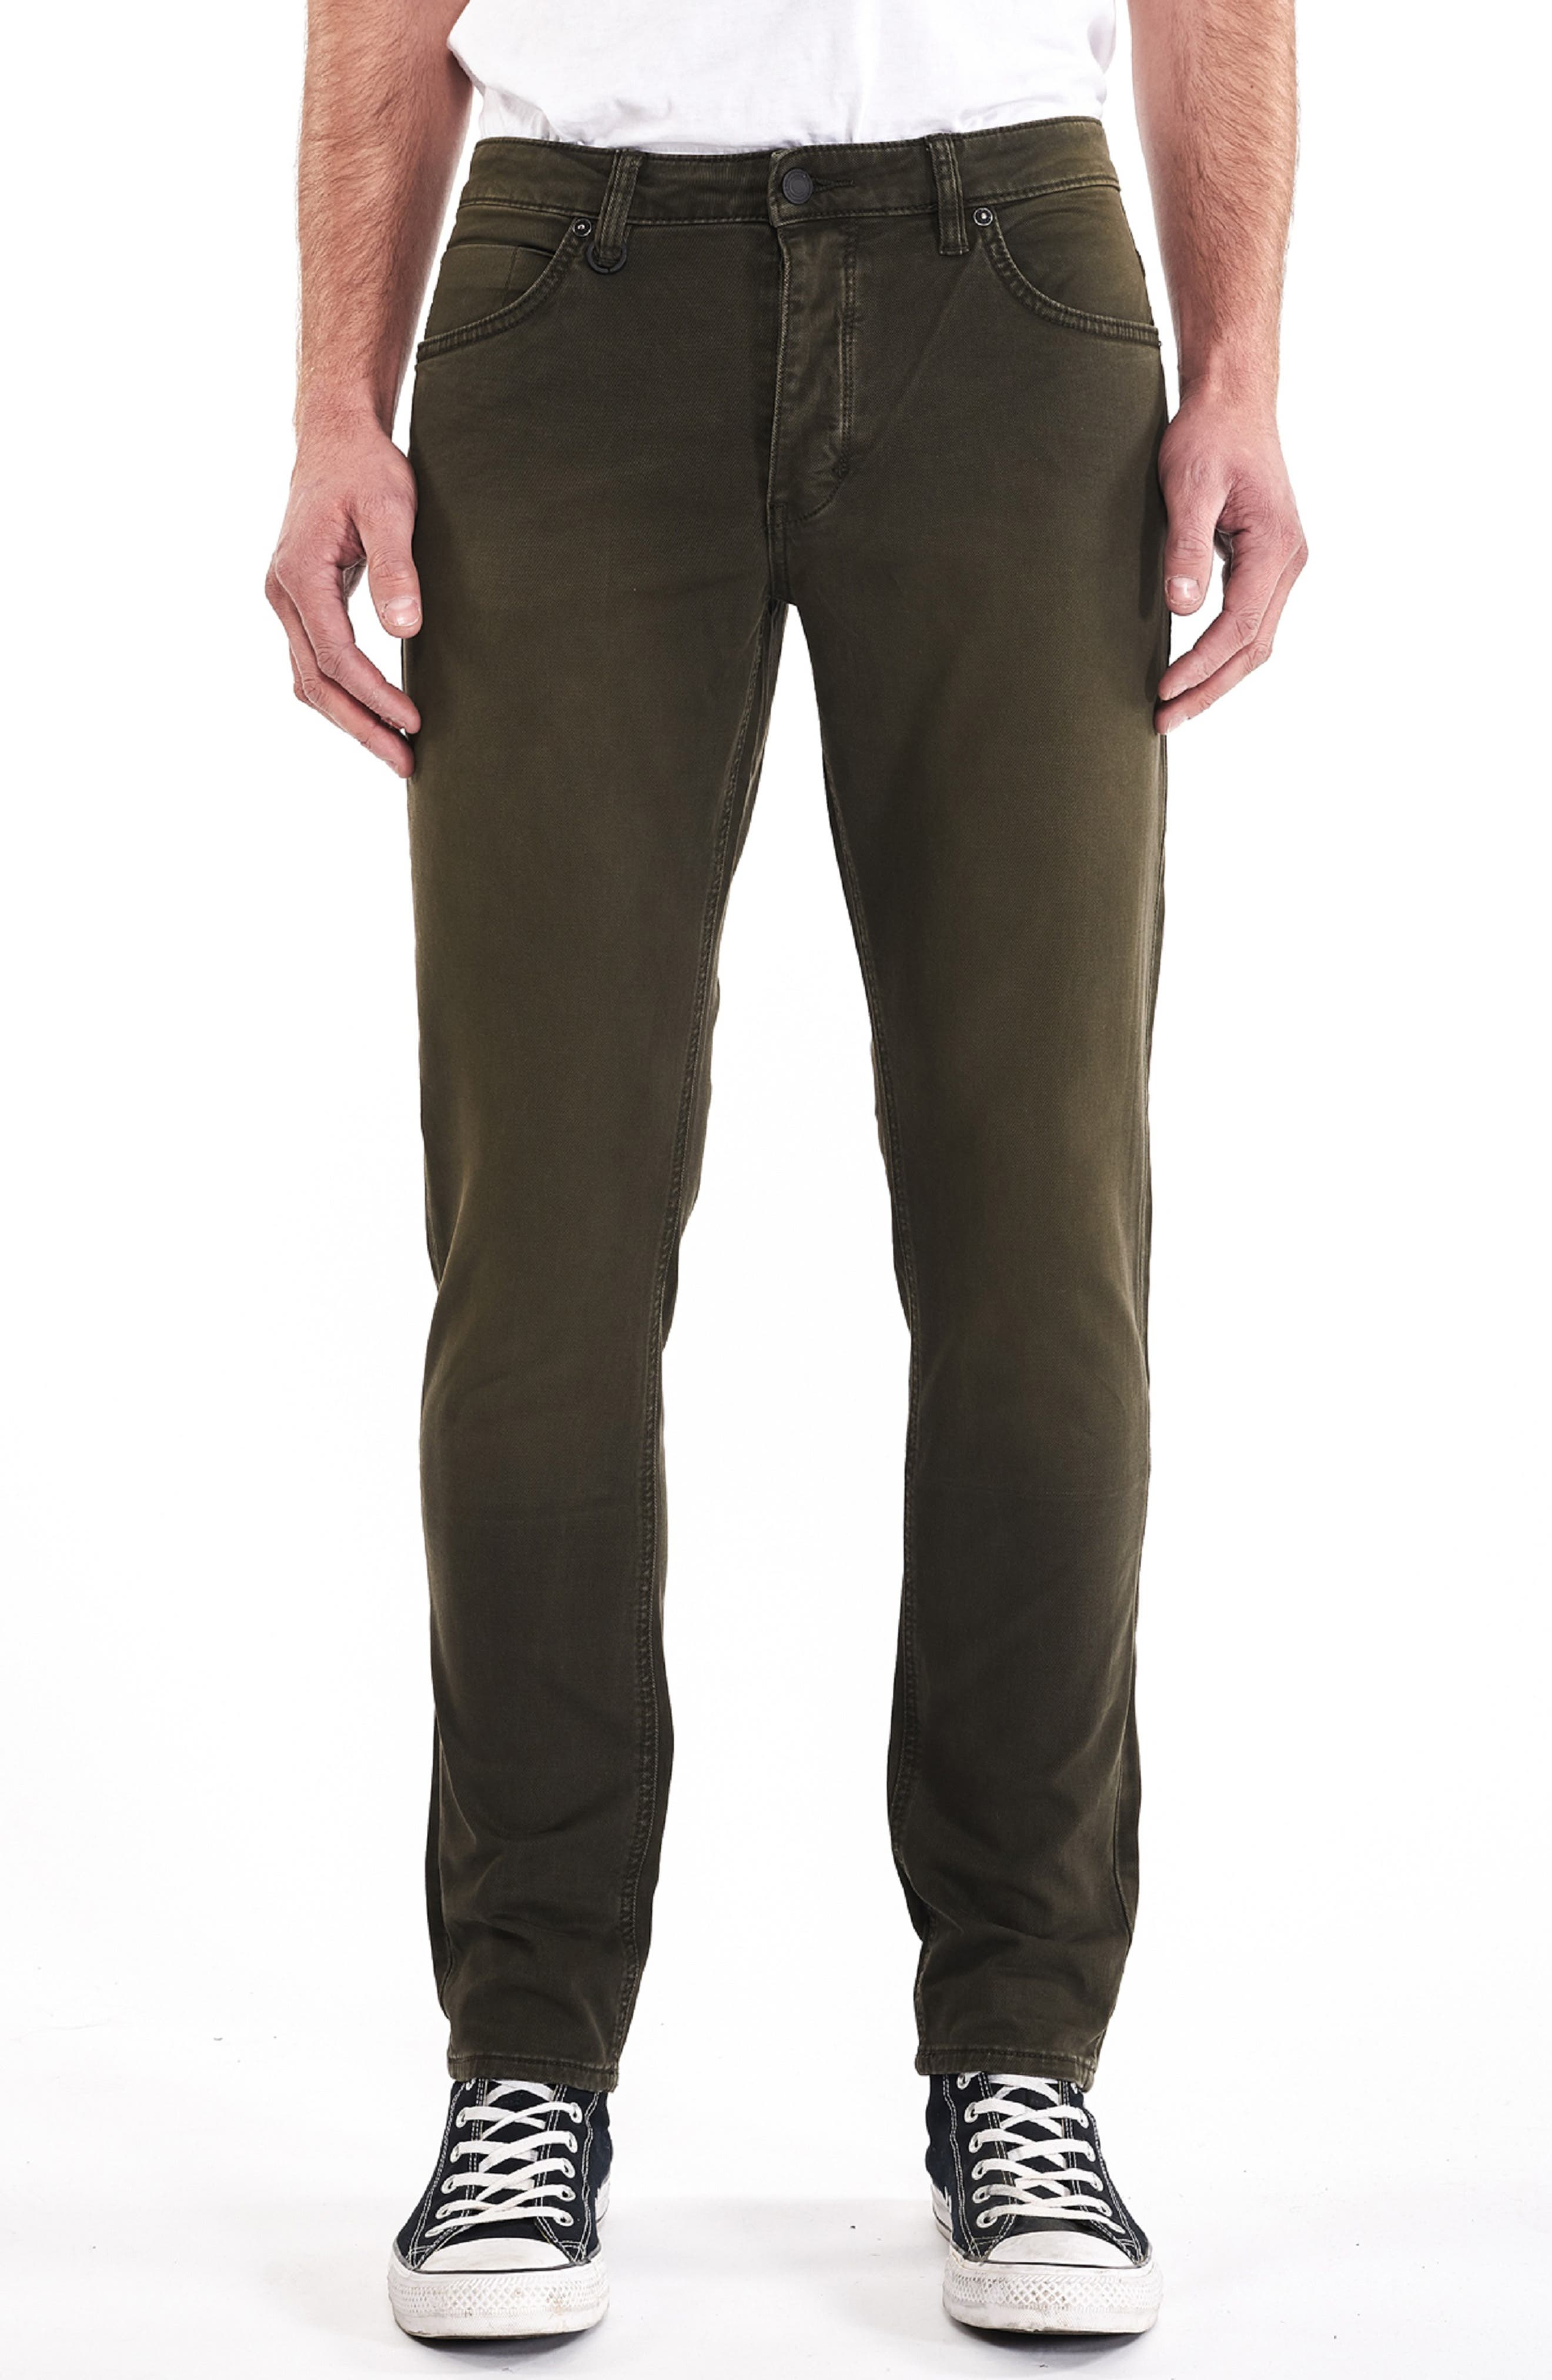 Lou Slim Fit Jeans,                             Main thumbnail 1, color,                             ARMAGEDDON GREEN